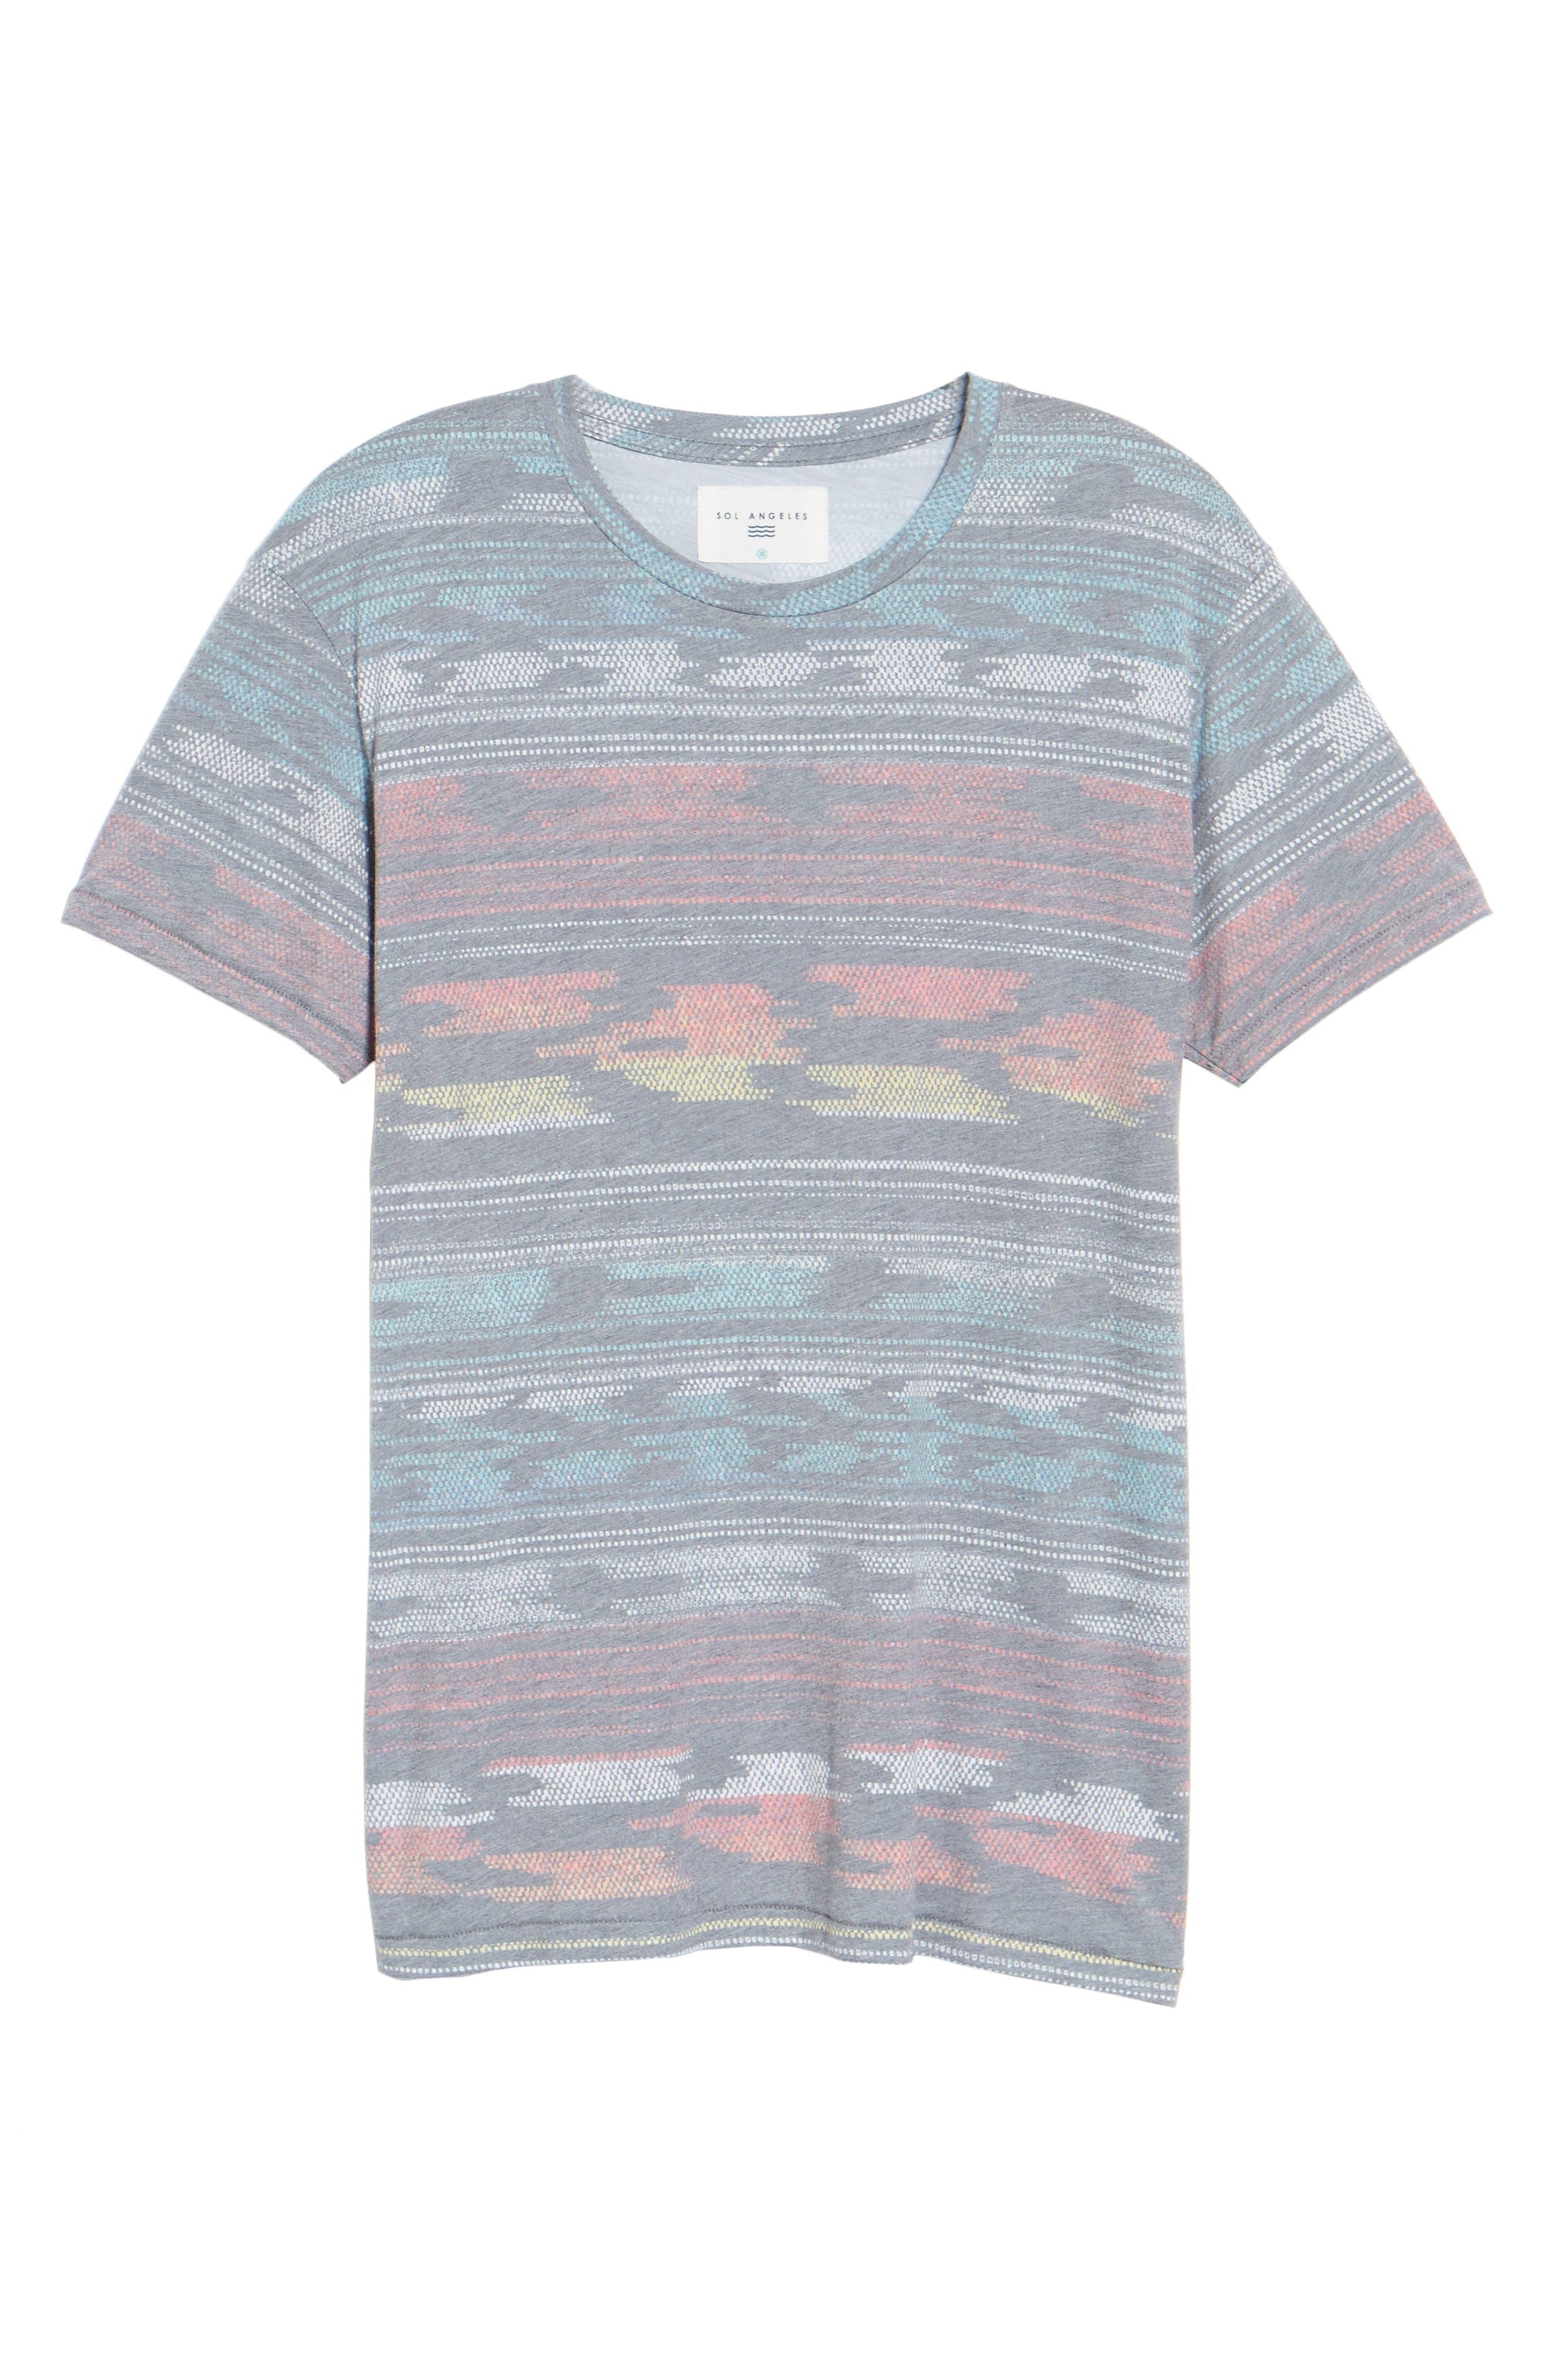 Madrugada T-Shirt,                             Alternate thumbnail 6, color,